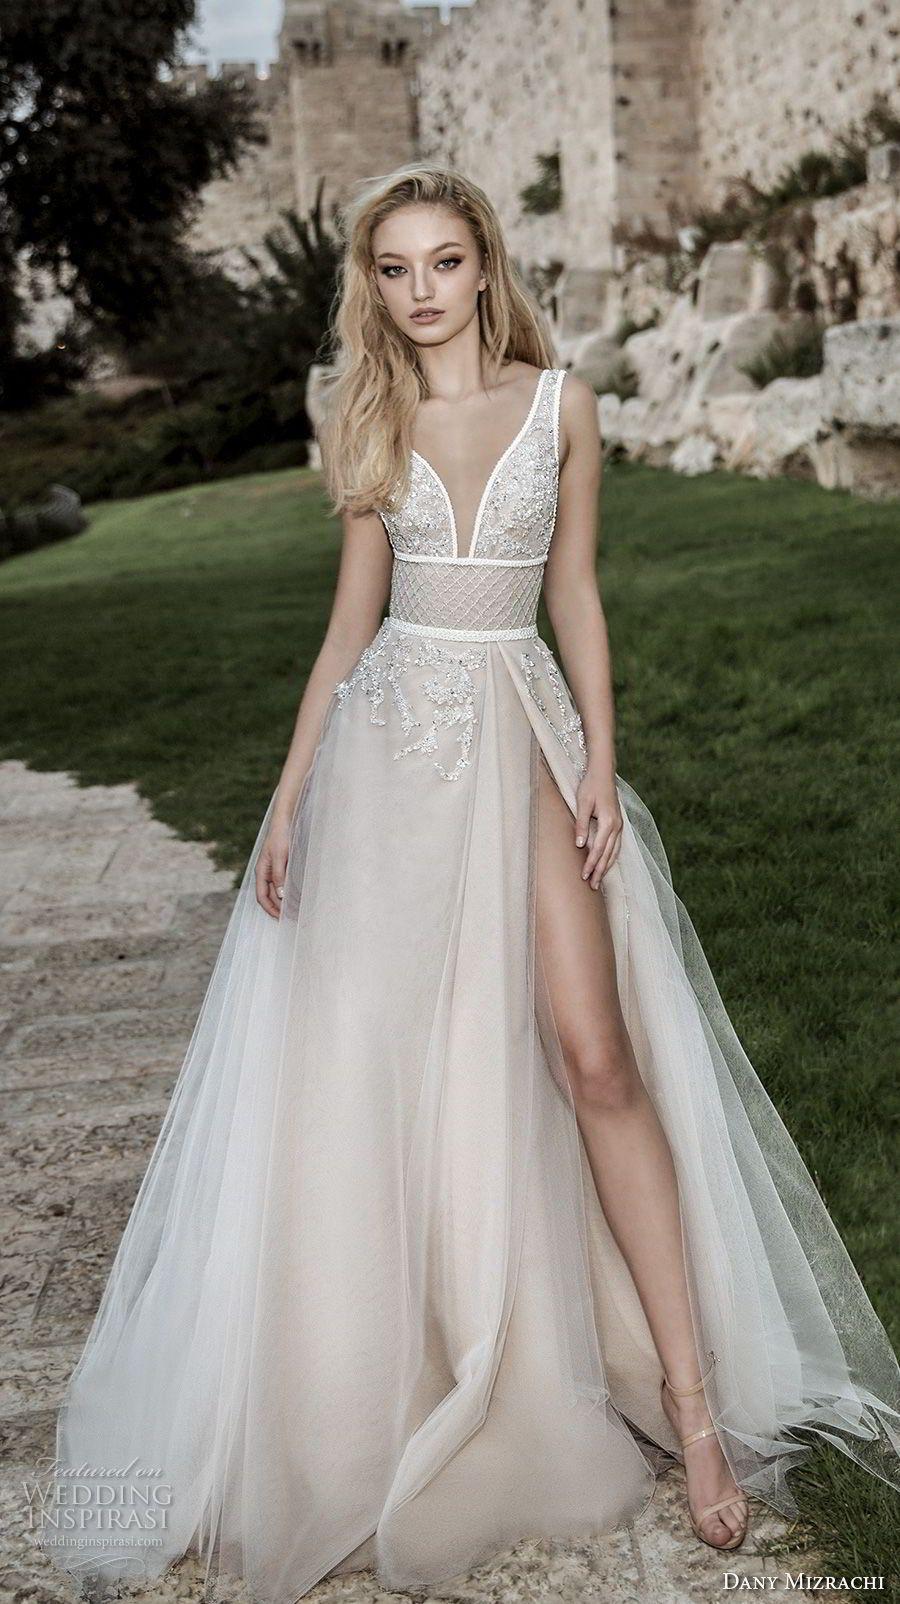 Dany mizrachi spring wedding dresses u ucjerusalemud bridal